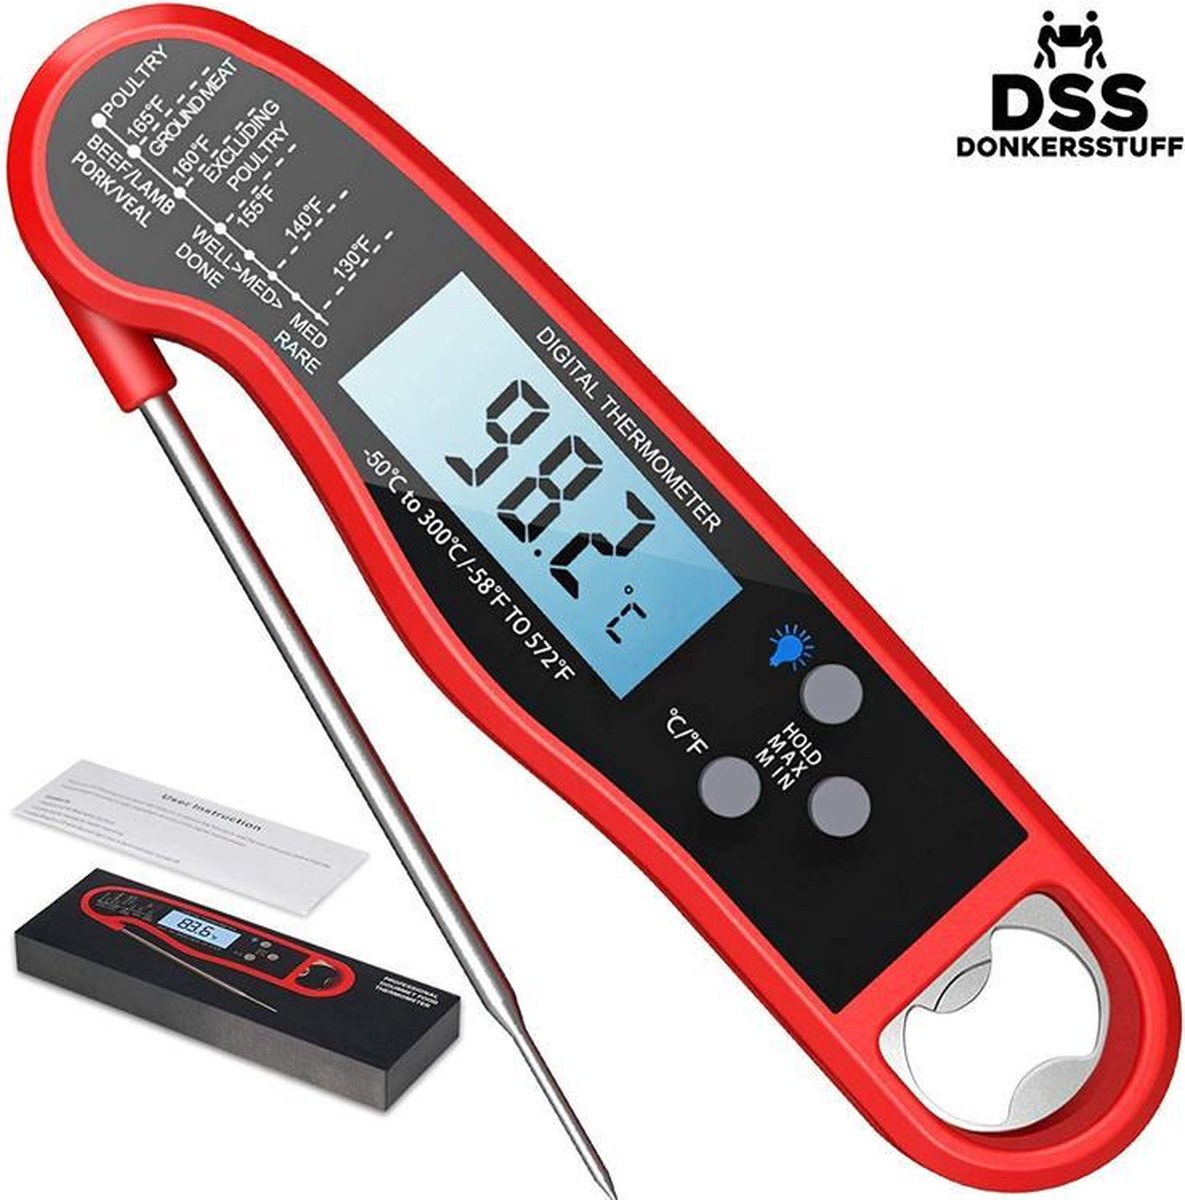 Donkersstuff - Vleesthermometer - Kernthermometer - Voedselthermometer - Kookthermometer - BBQ Thermometer - Bieropener - Tot 300°C